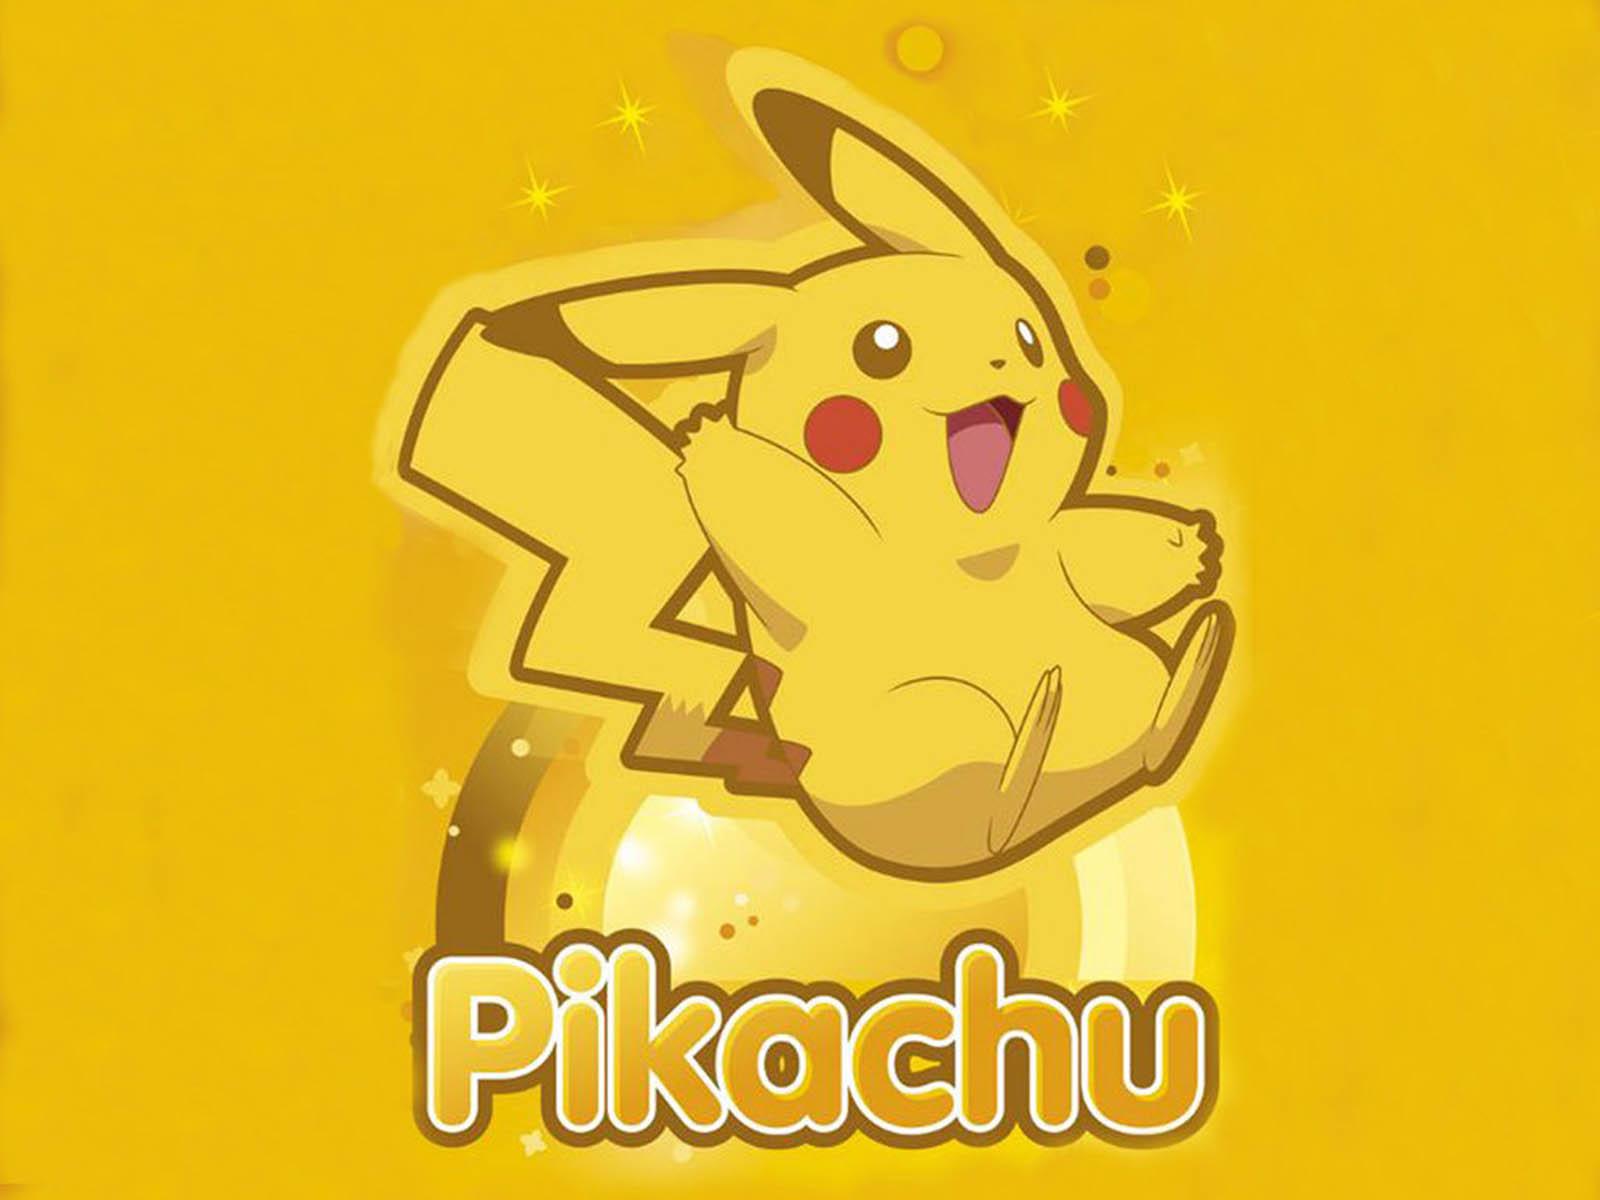 Pikachu Pokemon picture for wallpaper 1600x1200